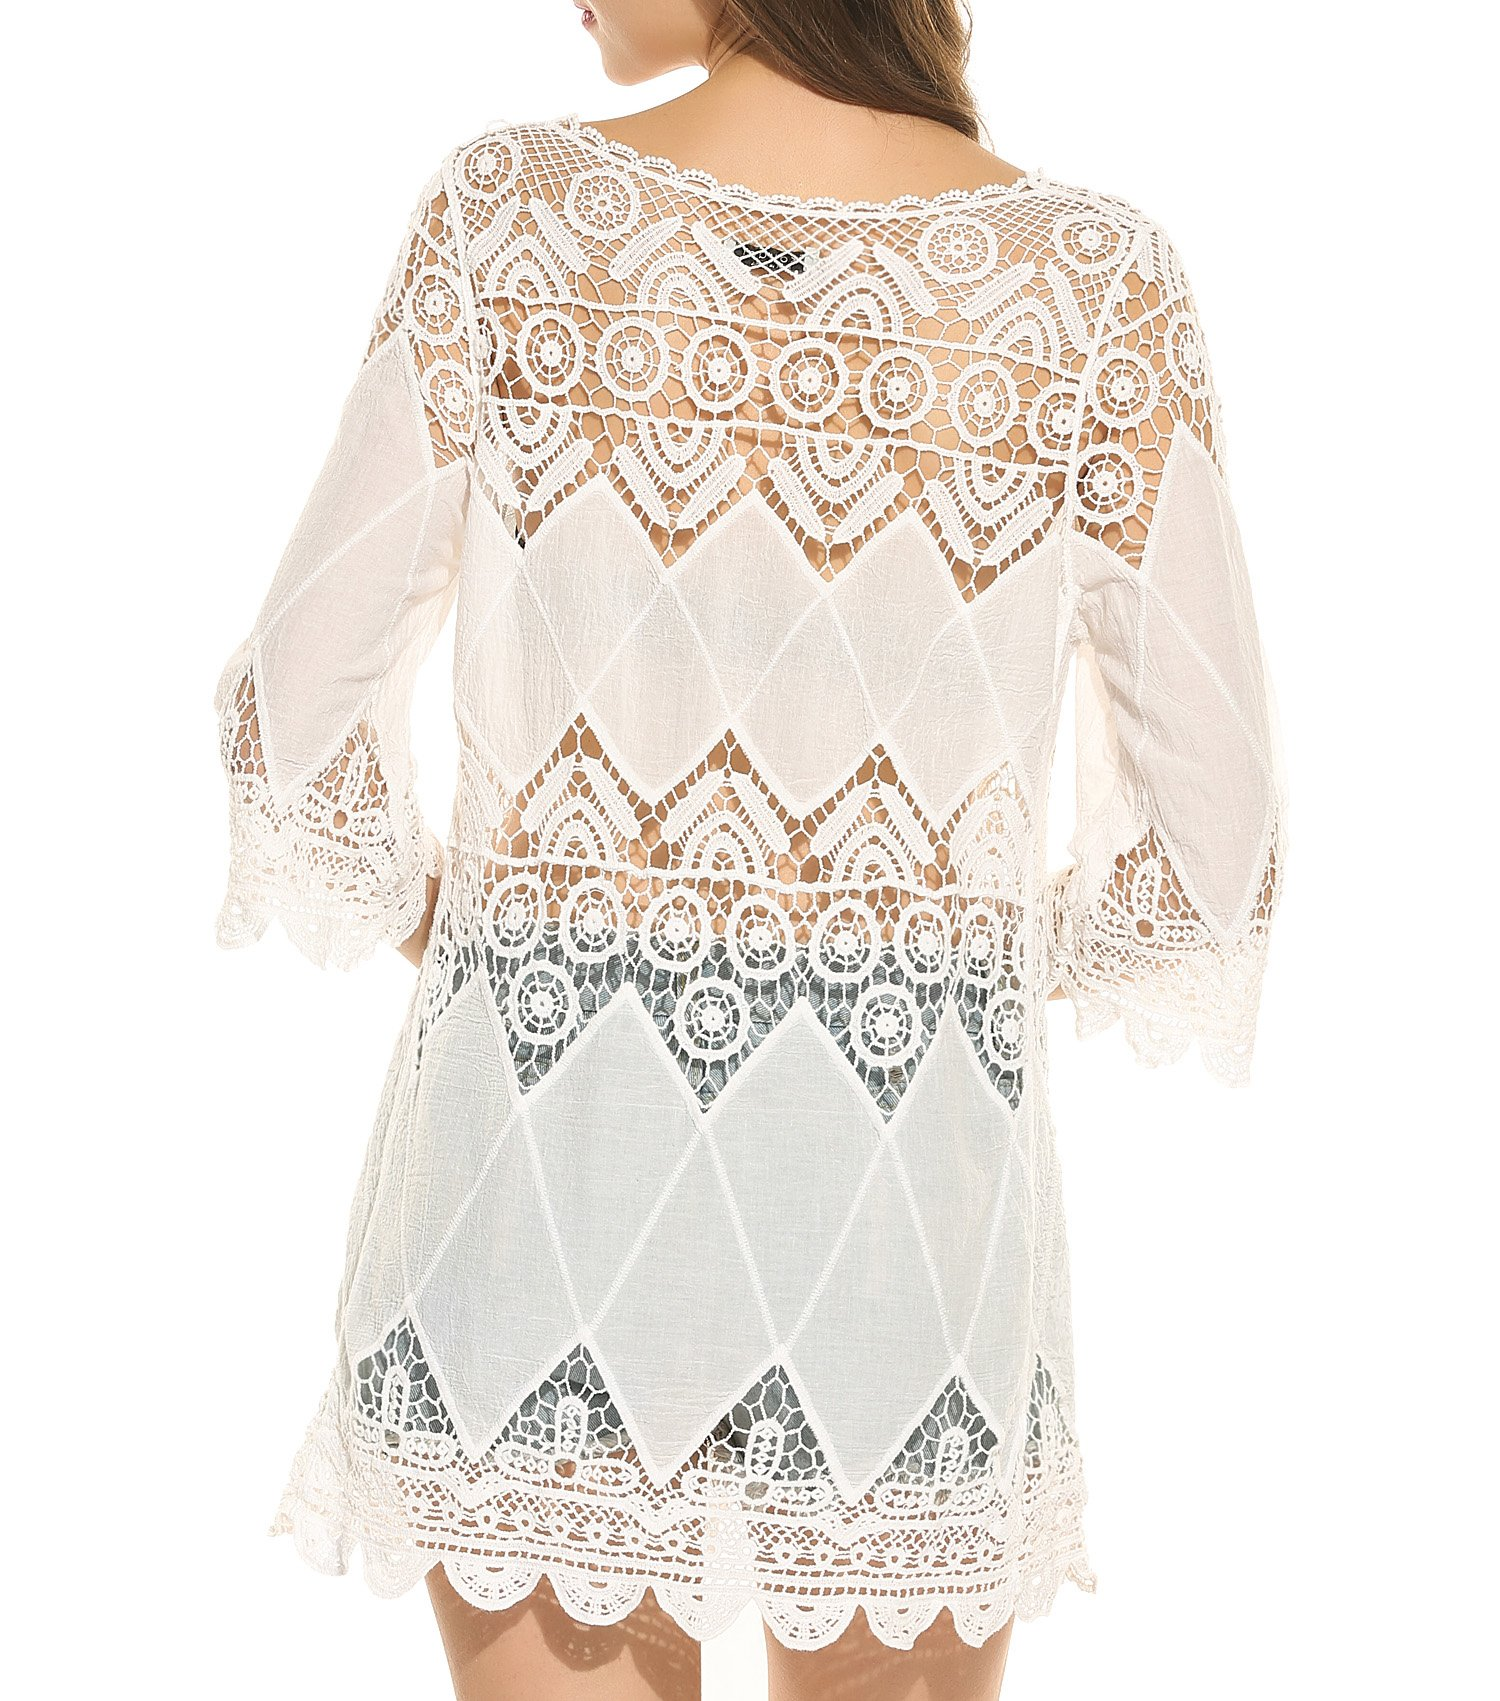 Ekouaer Cover Ups Women's Beach Dress Crochet Tunic Cover Up